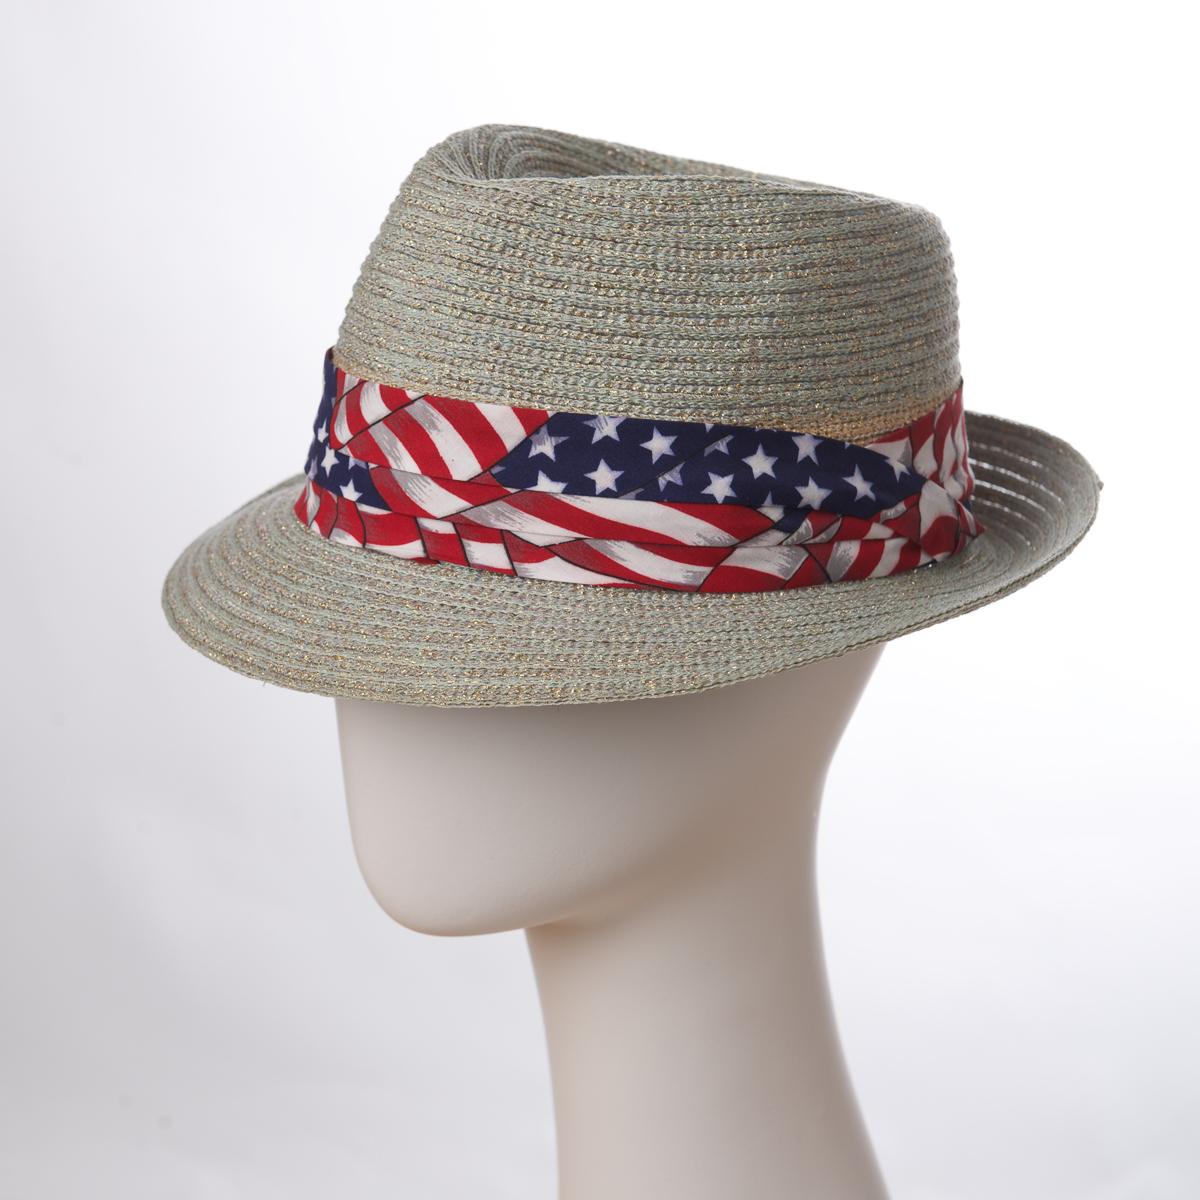 American Flag 3 Pleats Printed Puggaree Hat Bands P1551 31